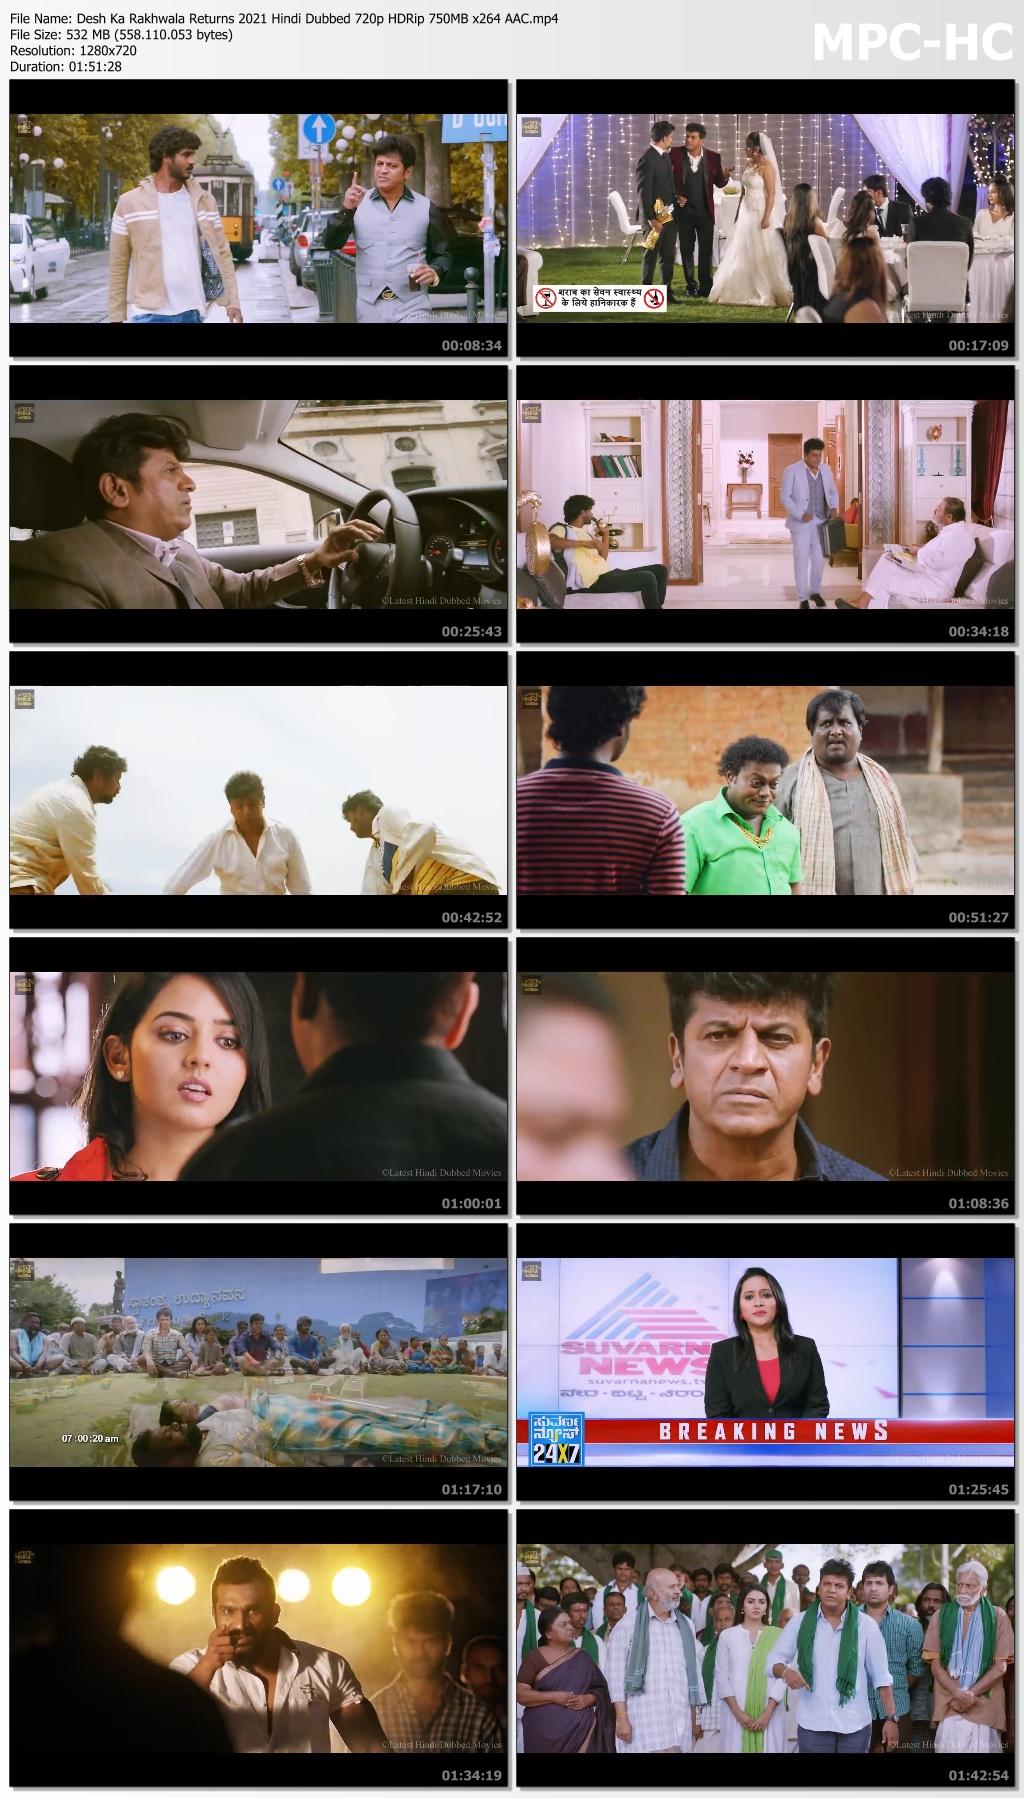 Desh Ka Rakhwala Returns 2021 Hindi Dubbed 720p HDRip 750MB x264 AAC